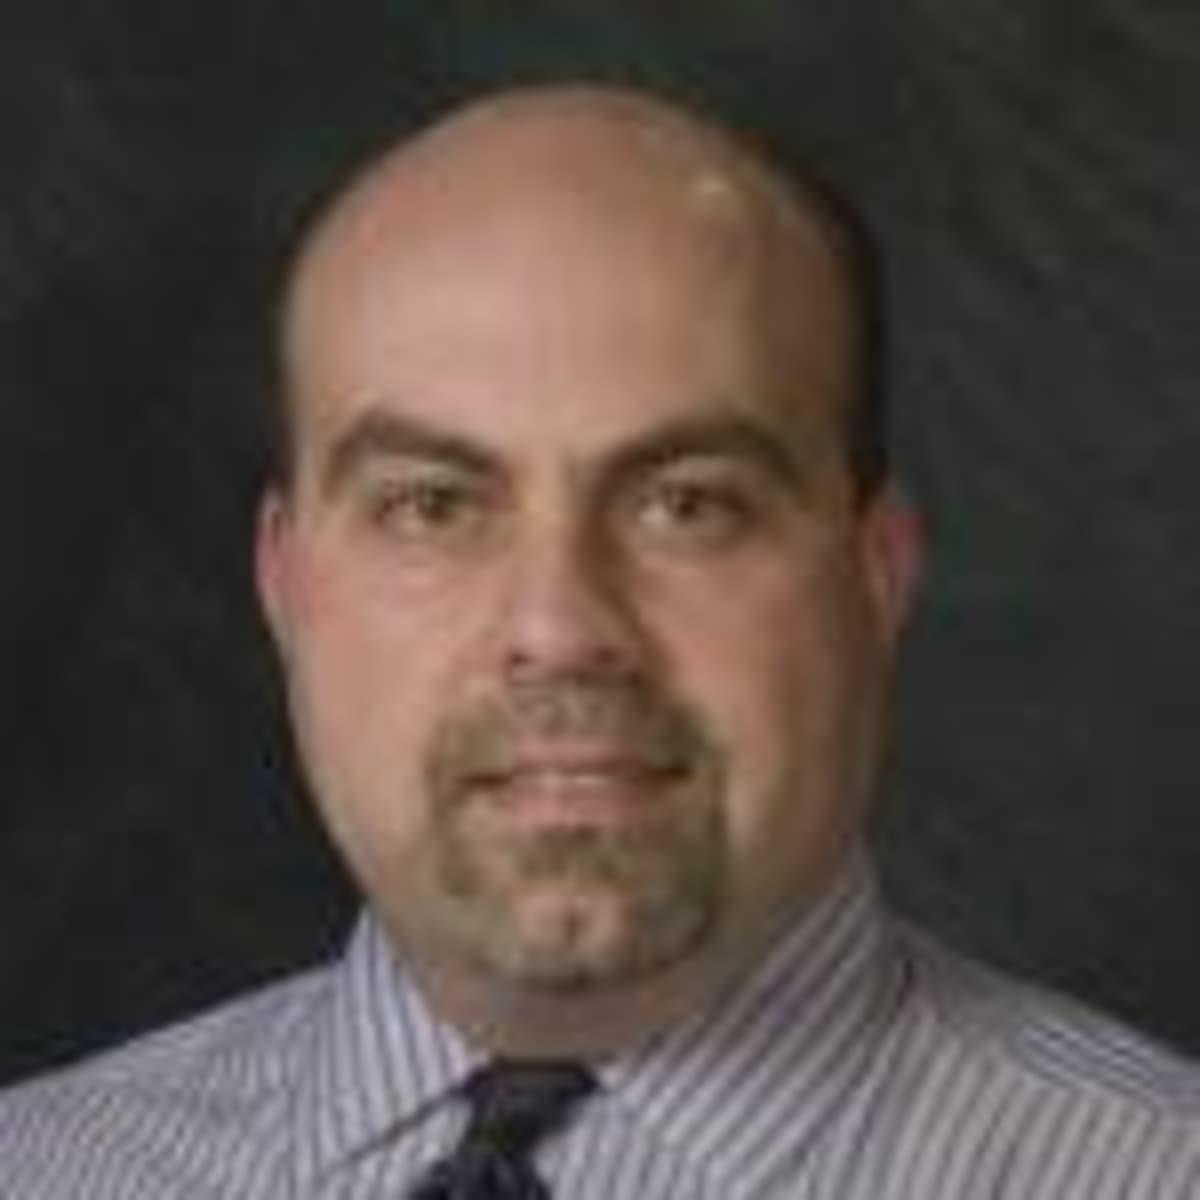 John muir urgent care walnut creek / Indoor rock climbing ct